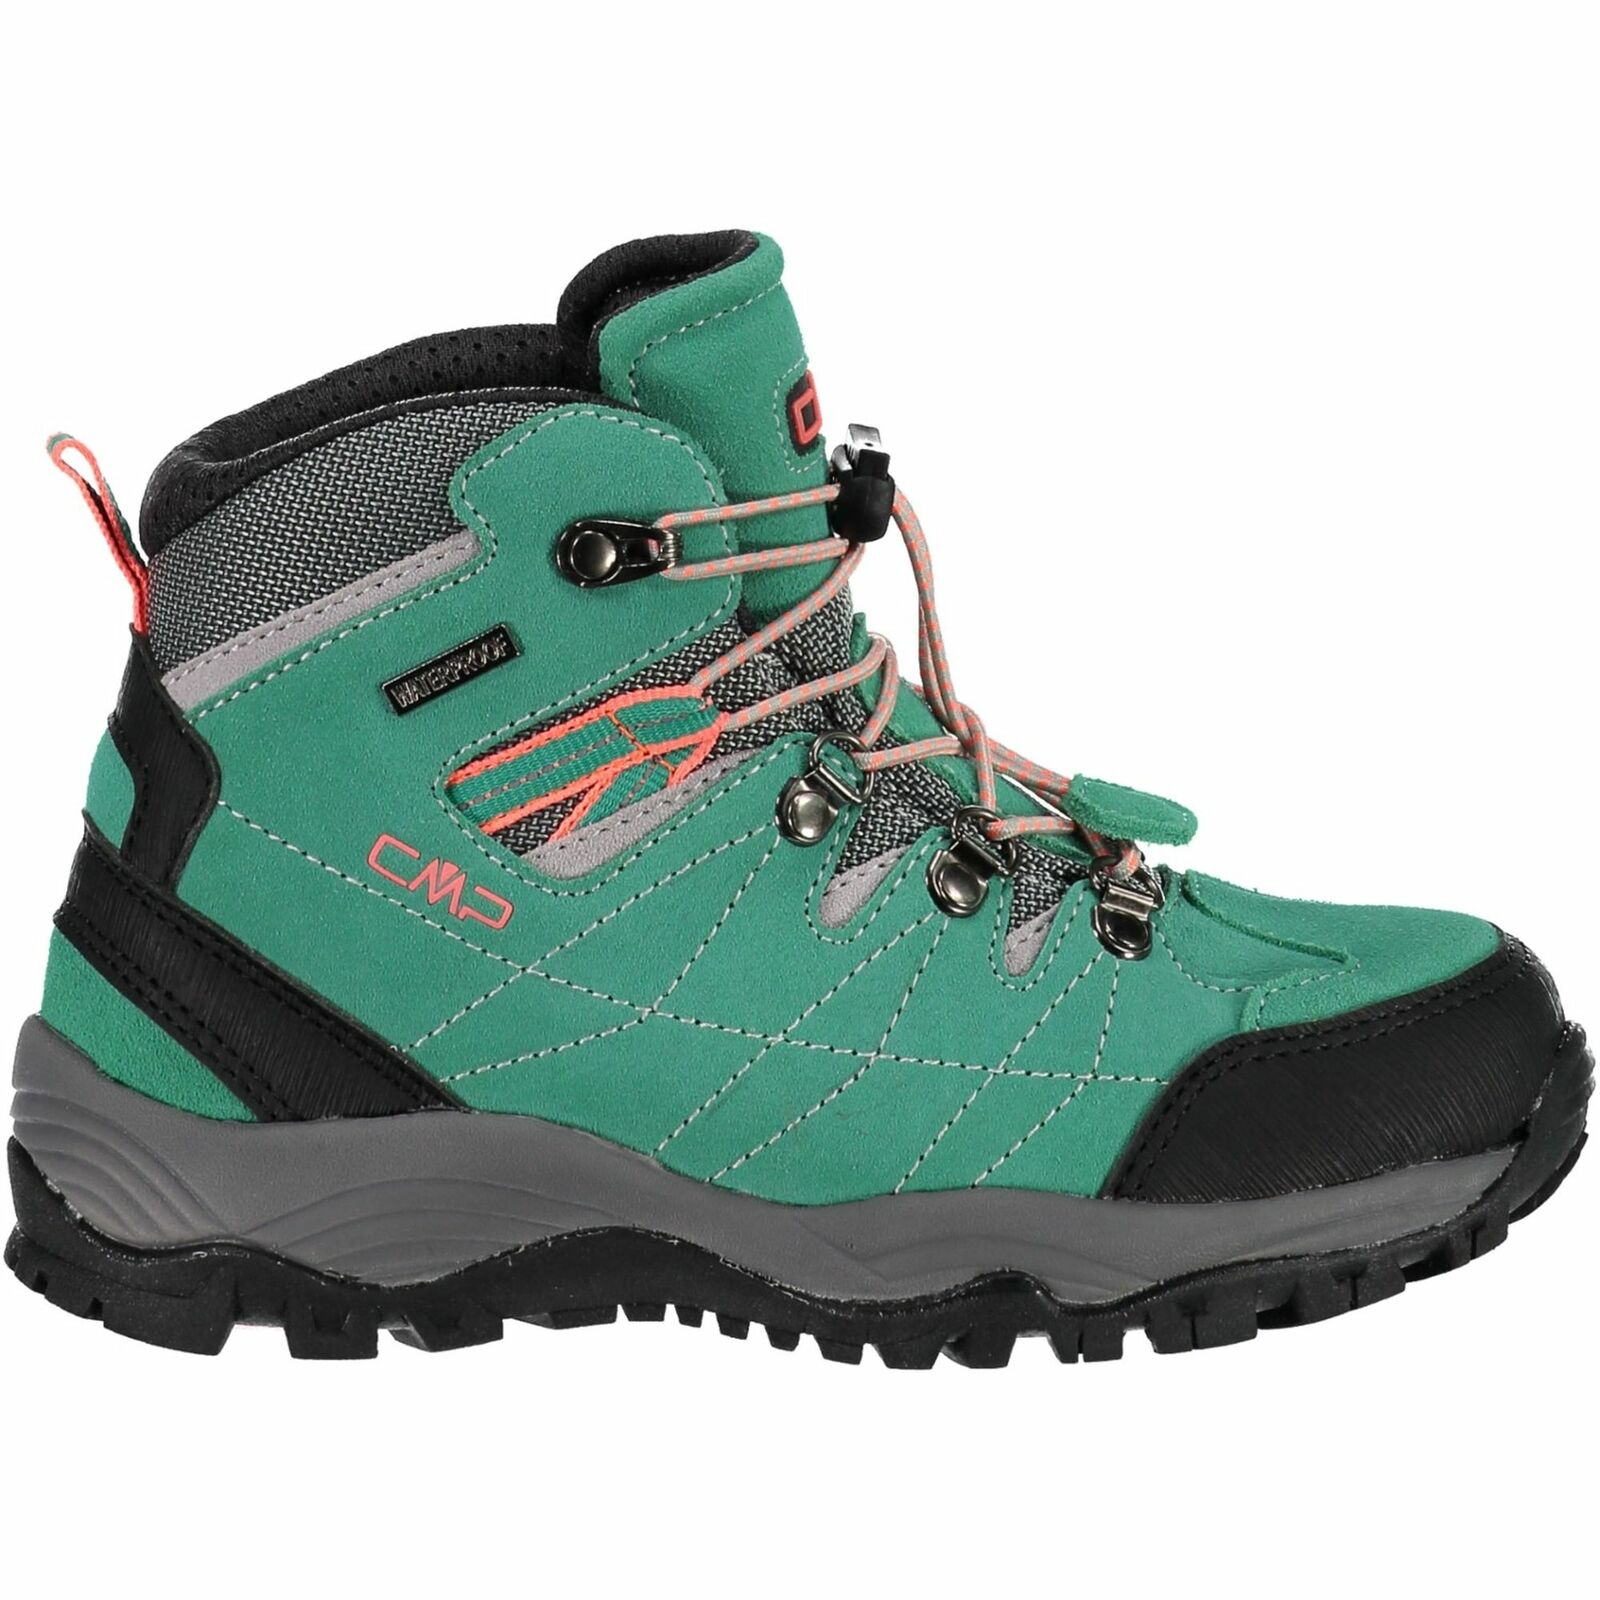 CMP trekking zapatos Al aire libreschuh Kids Arietis trekking  zapatos WP turquesa monocromo  a la venta